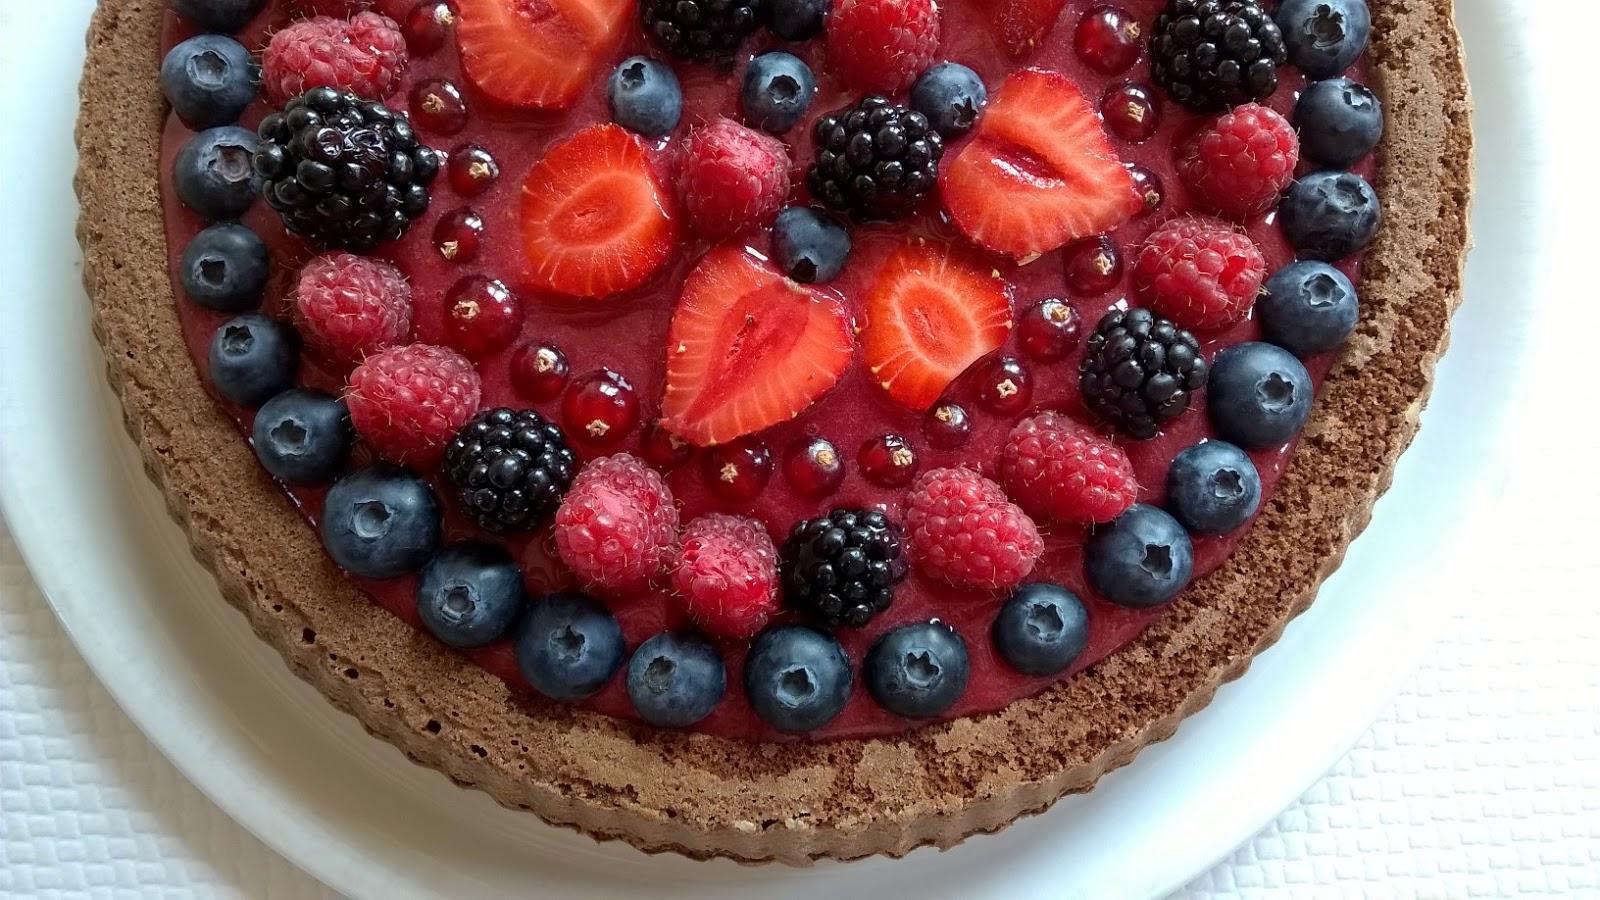 le cupcake quotidien tarte jolie au chocolat. Black Bedroom Furniture Sets. Home Design Ideas